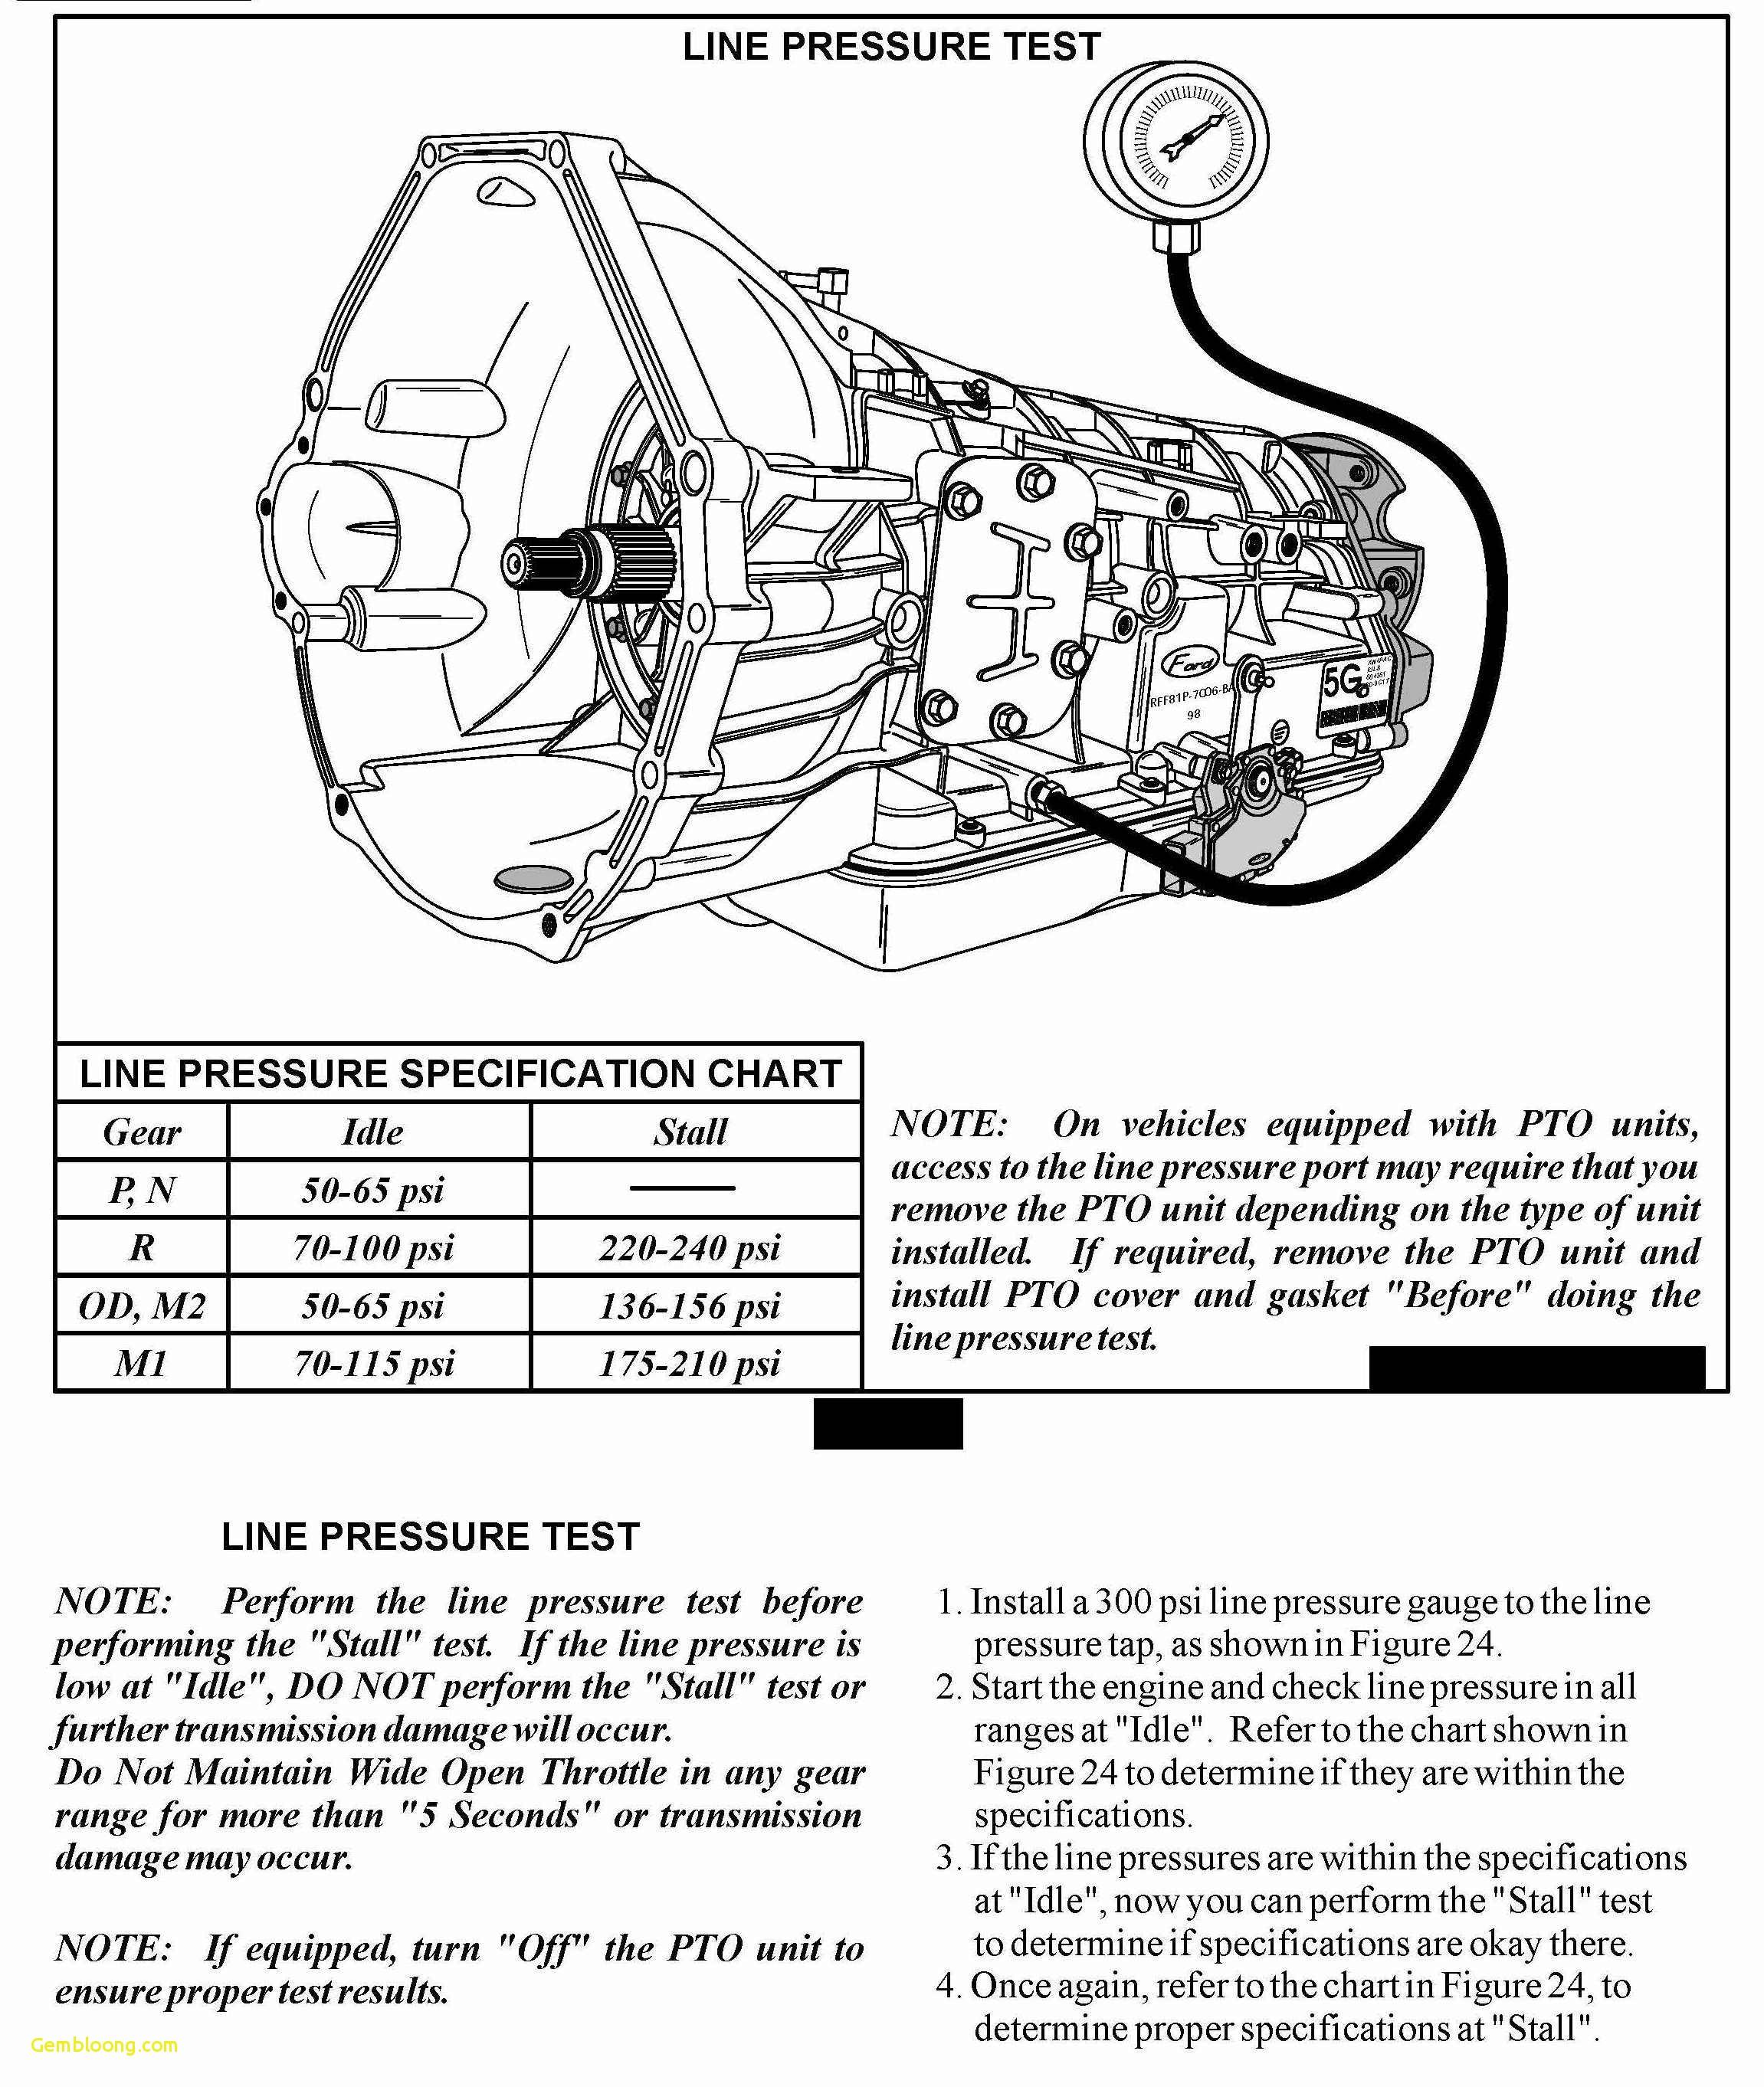 Transmission Diagram Manual Download ford Trucks Wiring Diagrams ford Truck Wiring Diagrams Of Transmission Diagram Manual